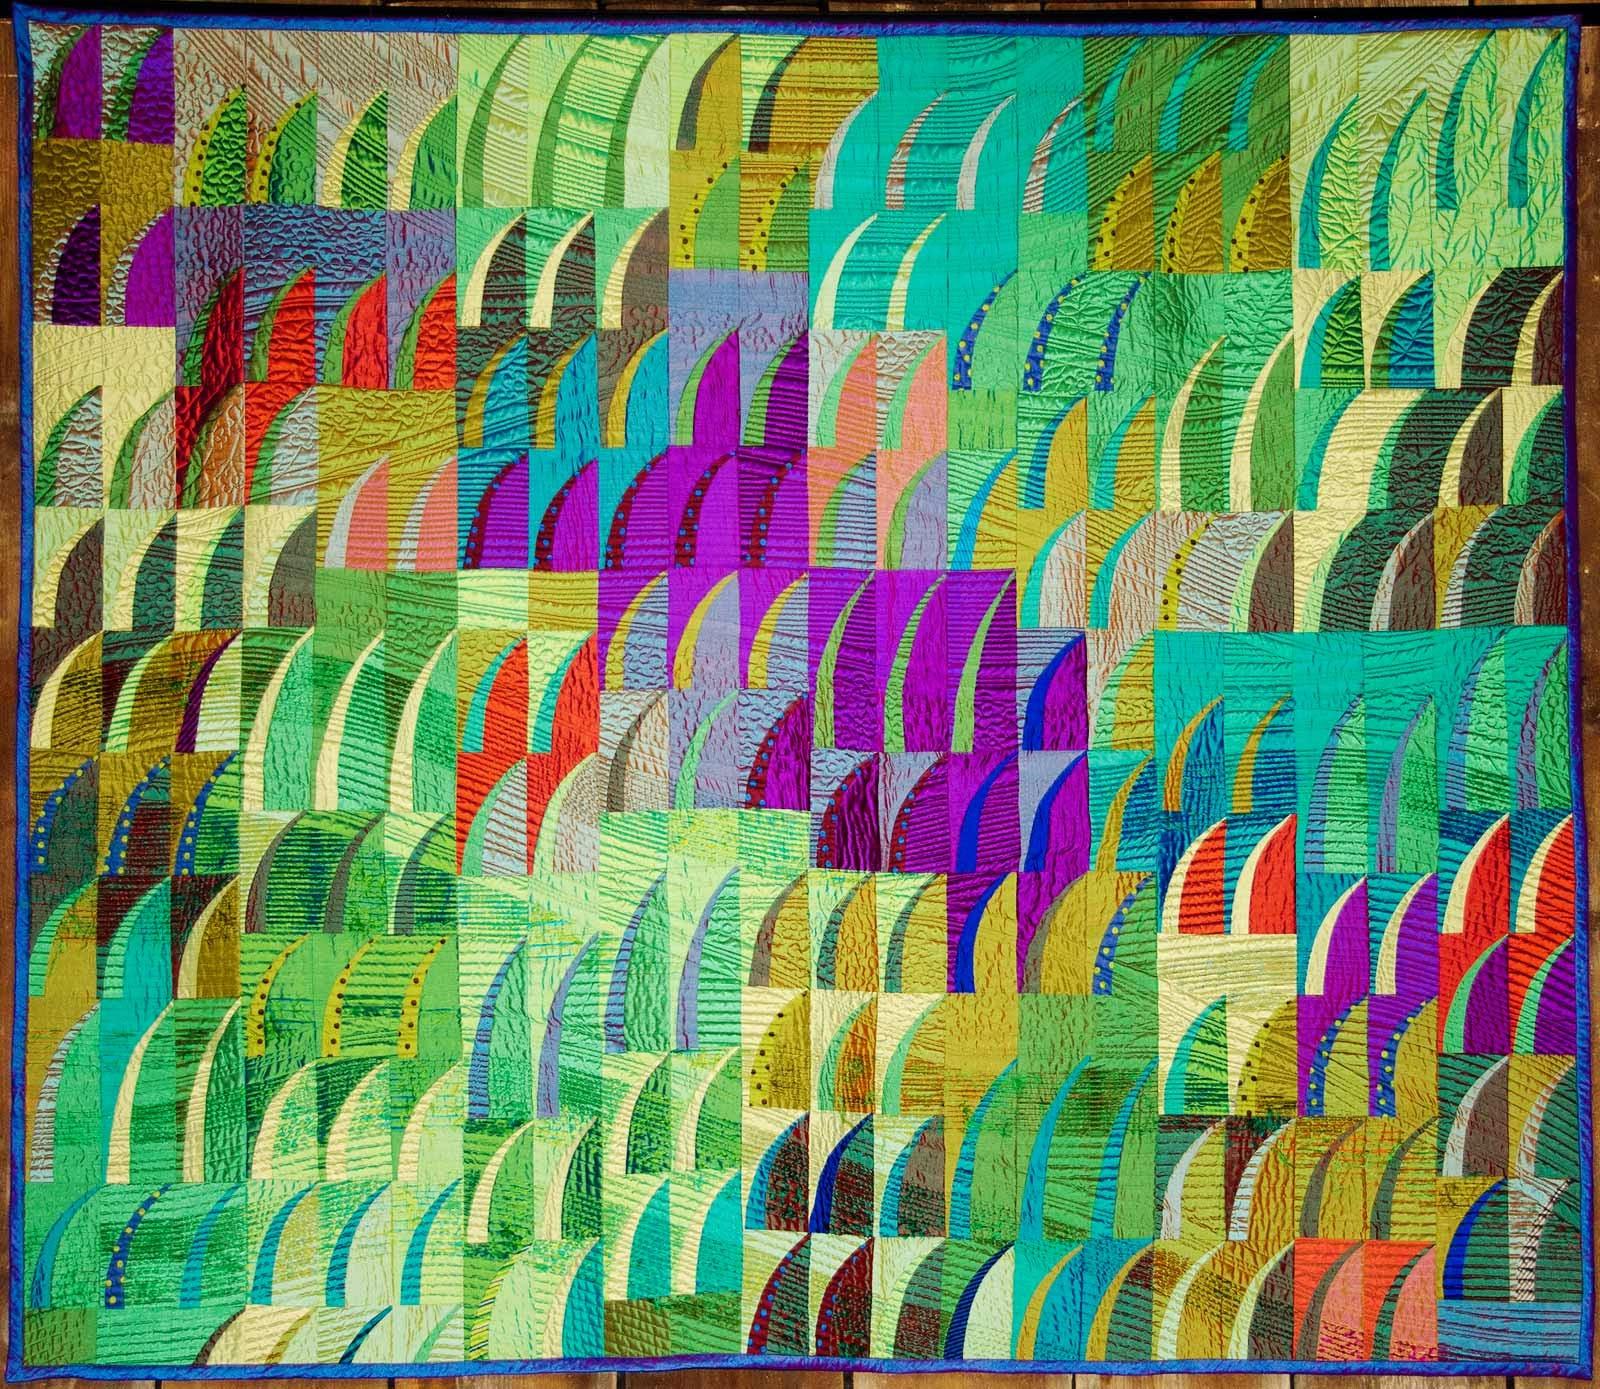 Quilt Nihon Japanese Quilt by Mikiko Misawa Thai silk